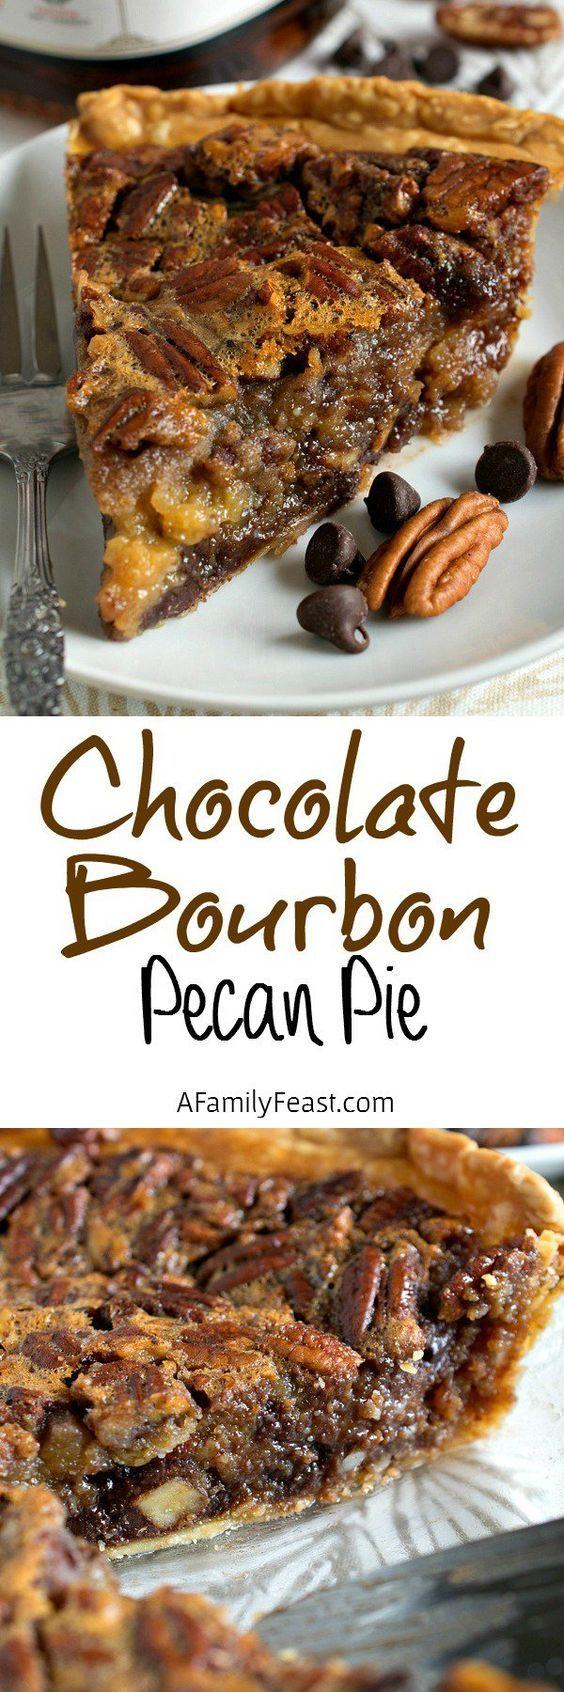 Chocolate Bourbon Pecan Pie - A classic dessert but kicked up a notch ...